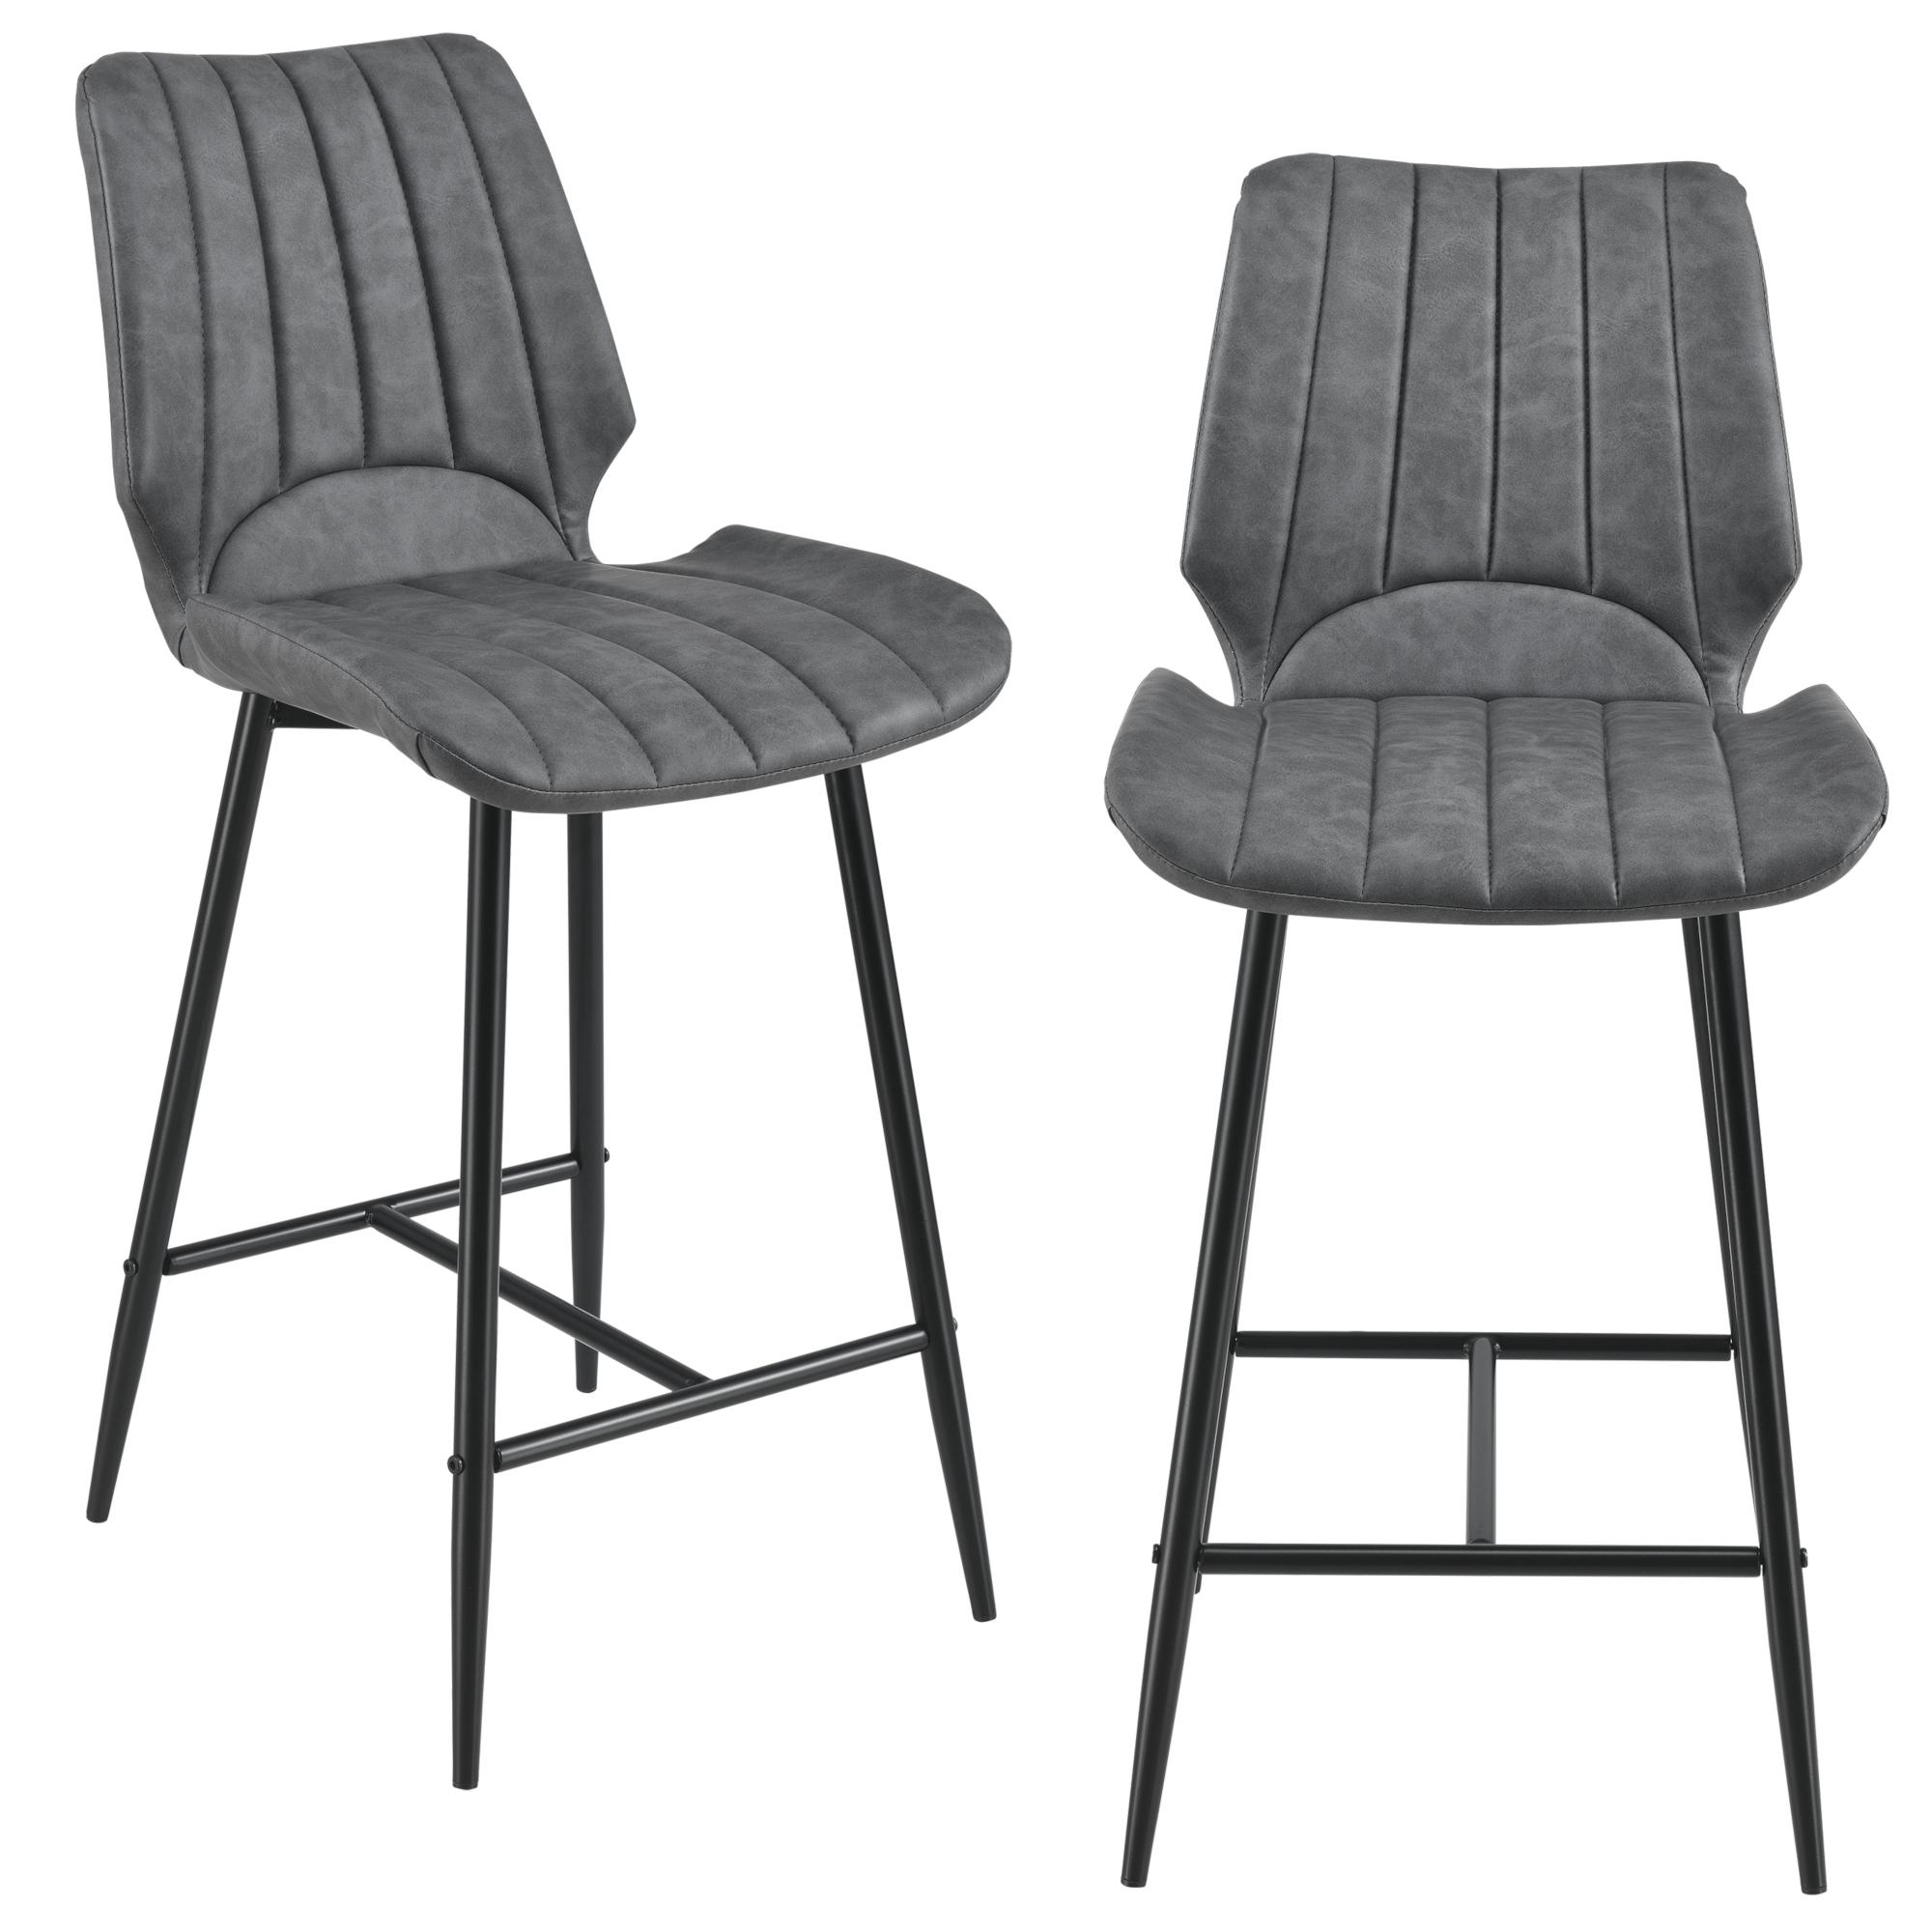 [en.casa]® Barová židle AACM-9035